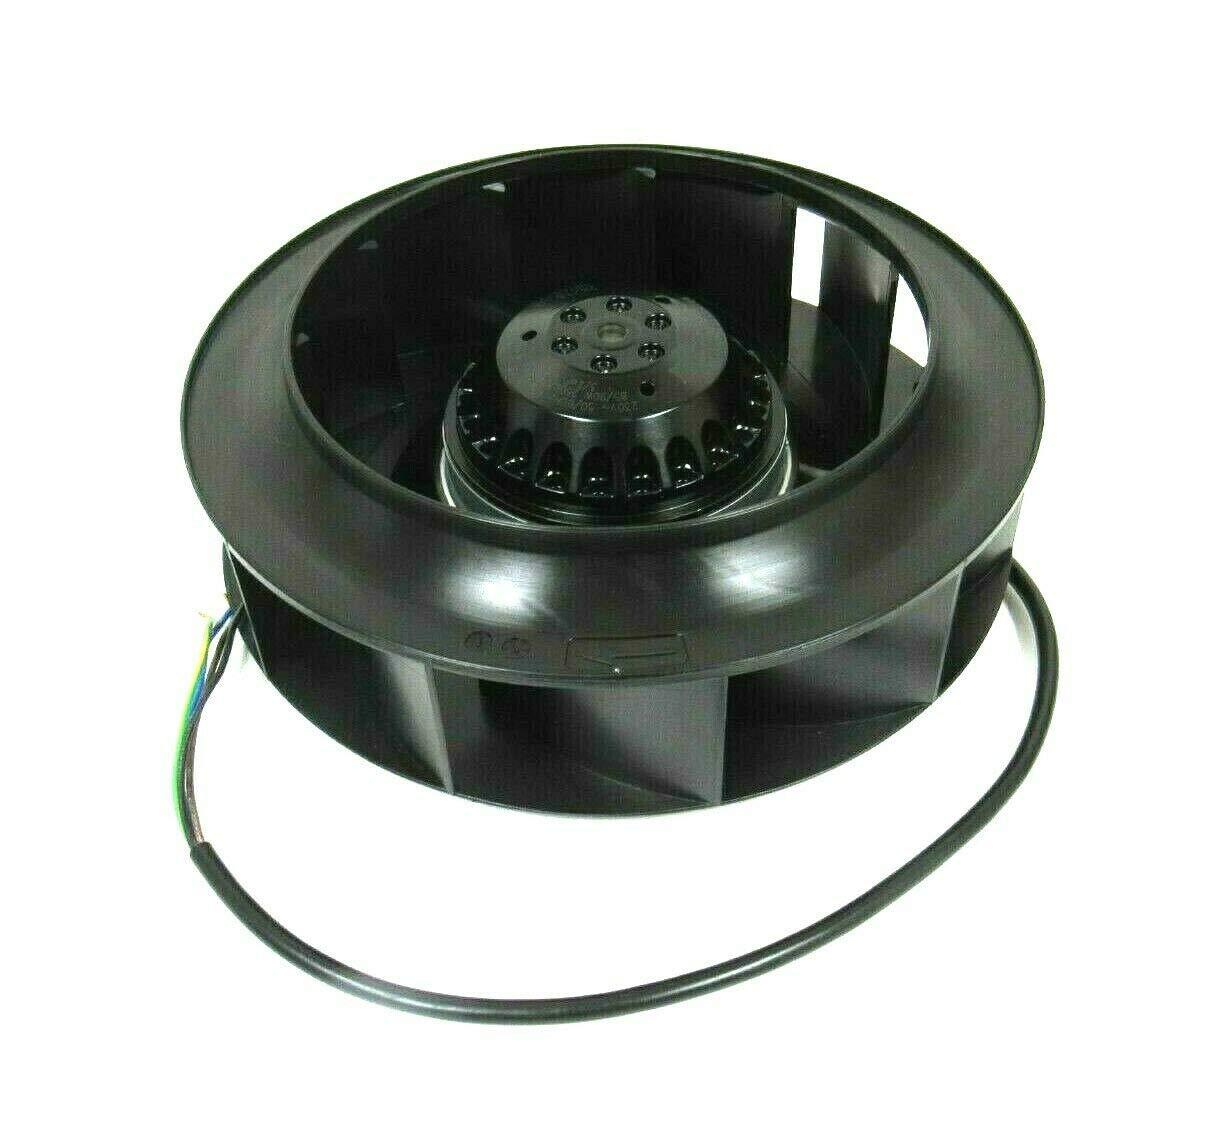 Original New ebmpapst R2E220-AA40-05 230V 0.38/0.40A Turbine Centrifugal Fan by EBM Papst